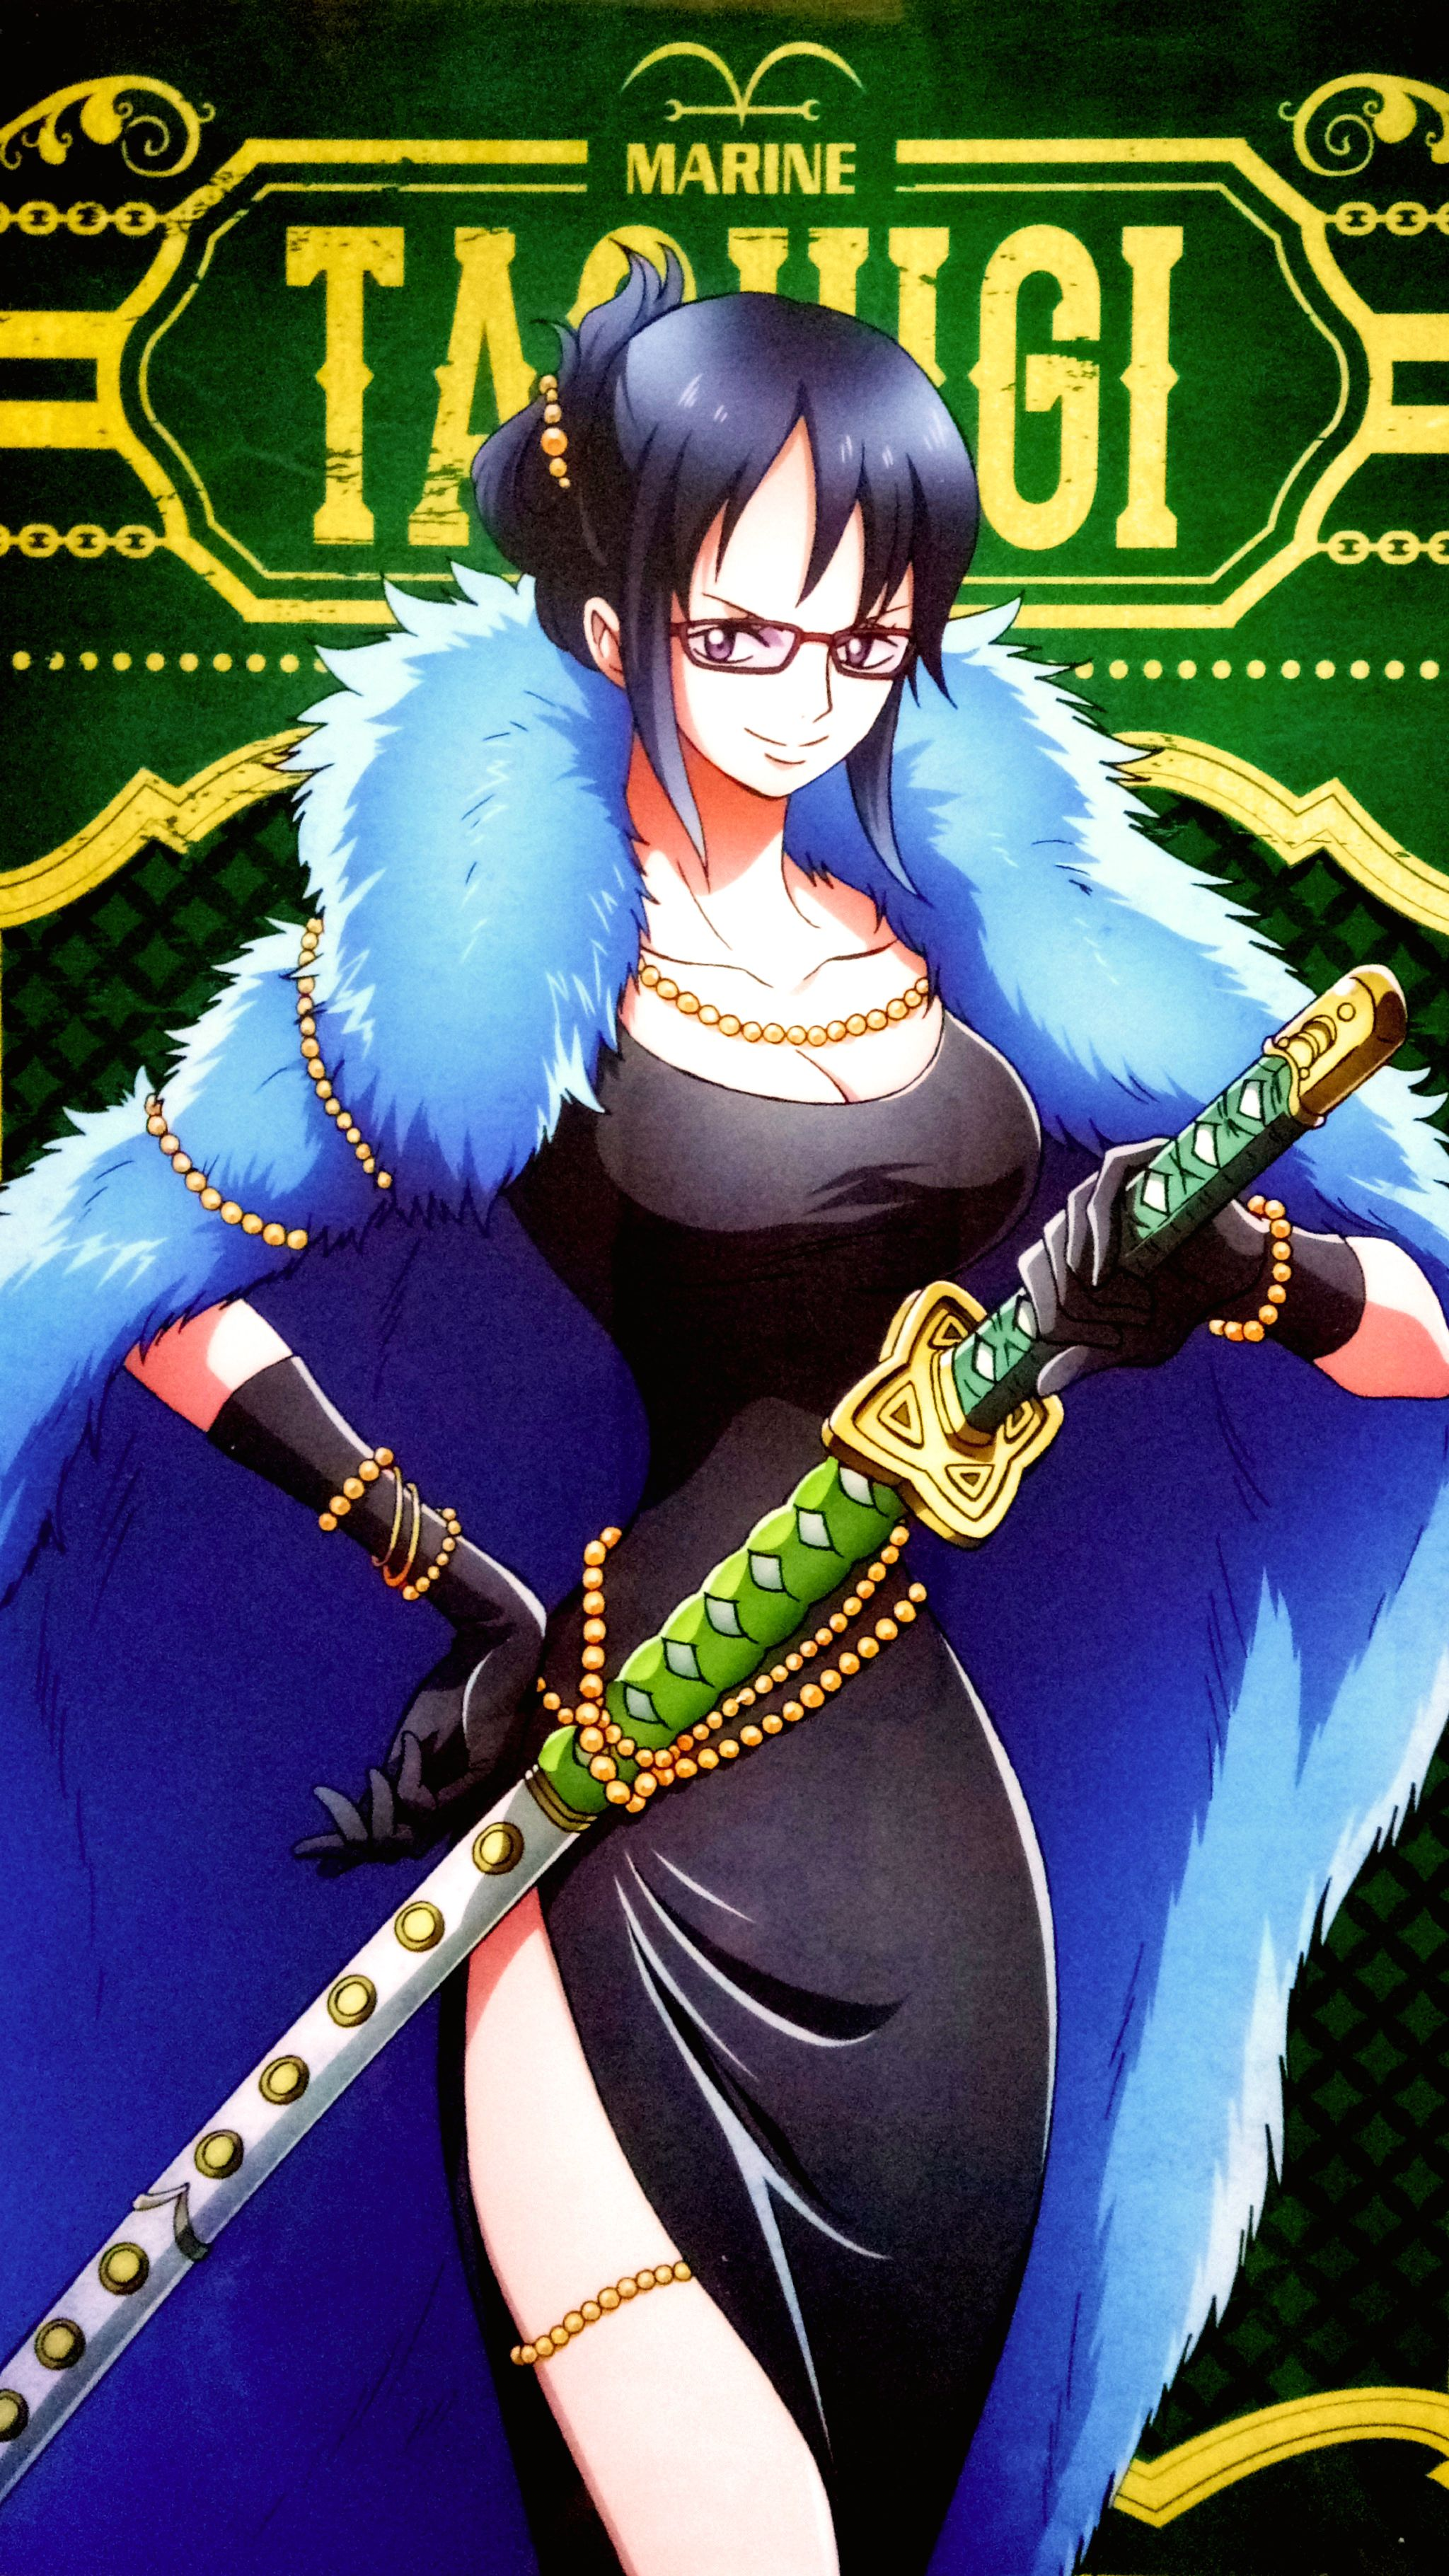 2048x3641 (76%) | Manga anime one piece, One piece images